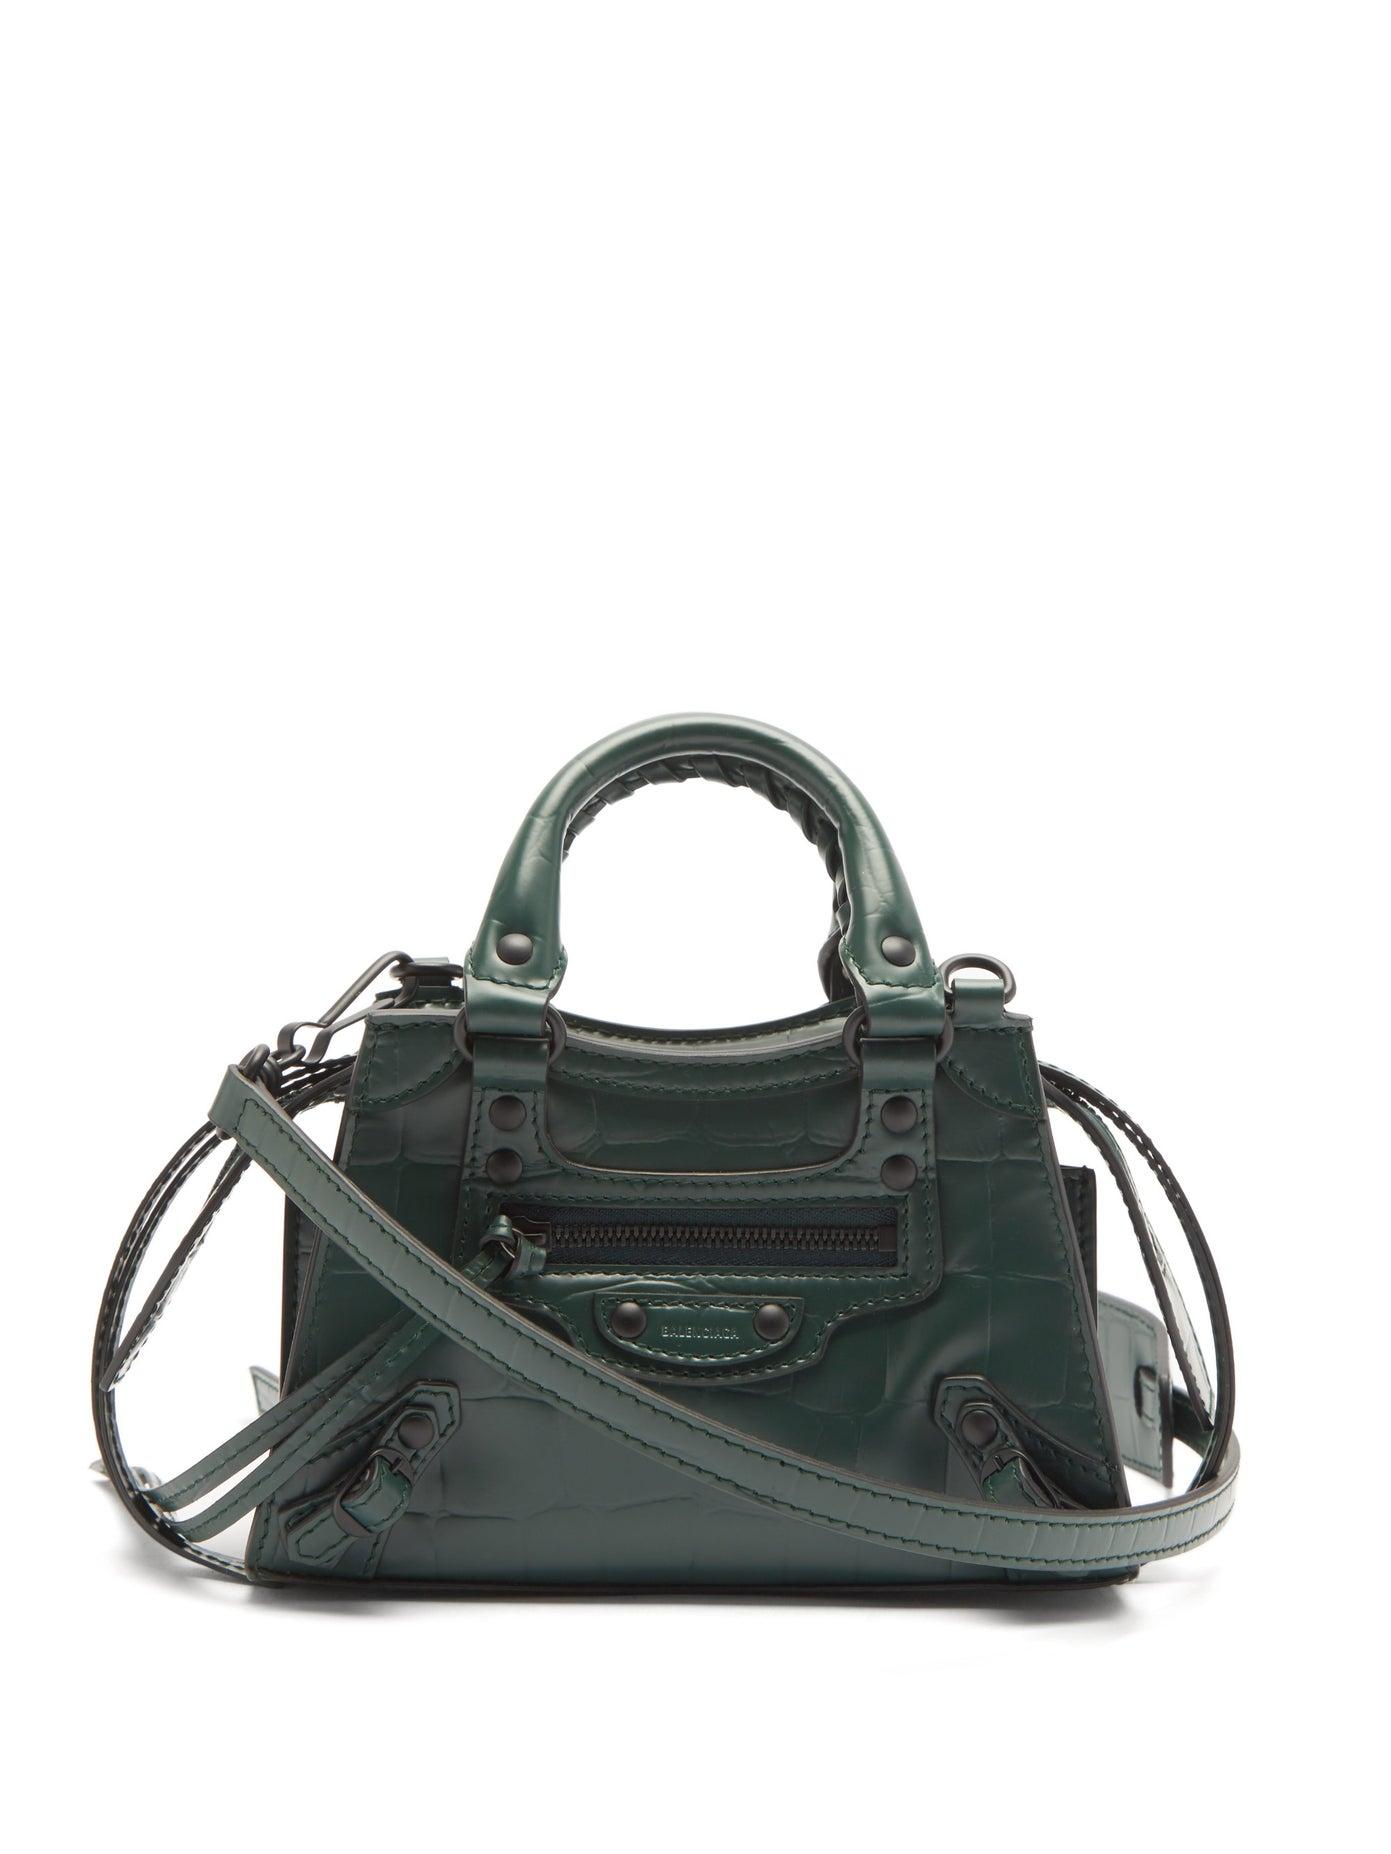 BALENCIAGA, Neo Classic City nano crocodile-effect leather bag, 2520лв